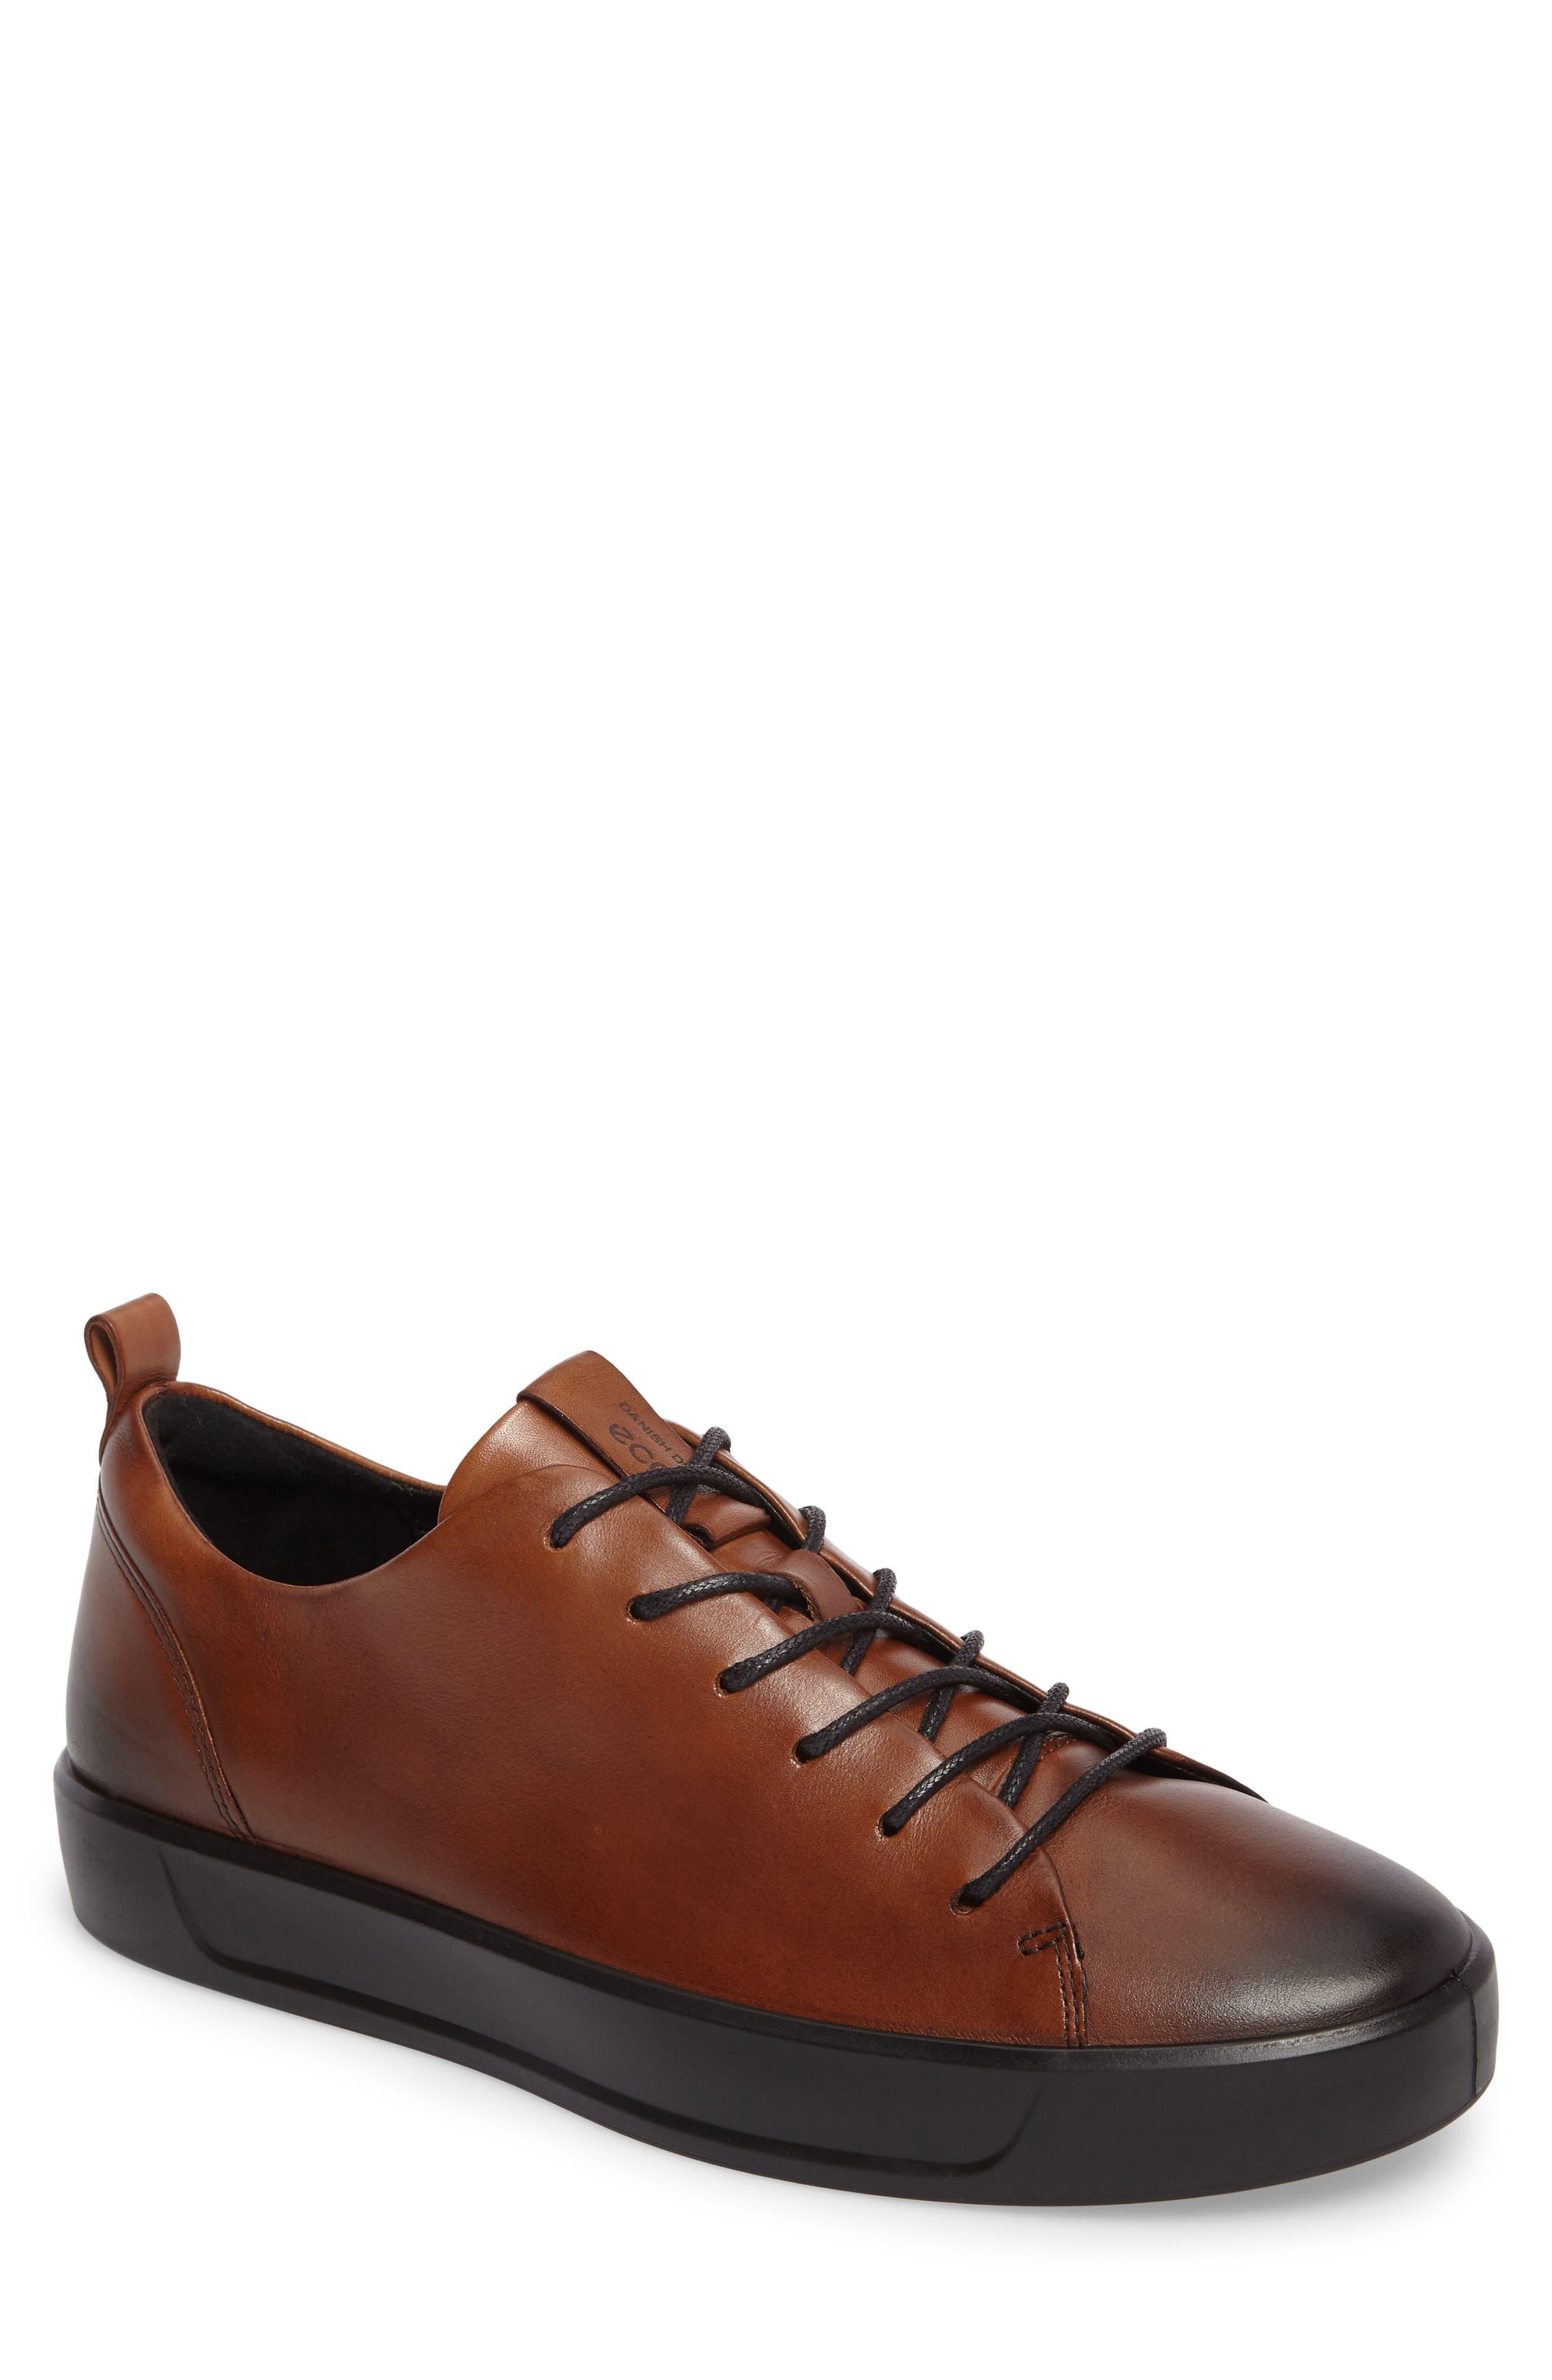 Main Image - ECCO Soft 8 Street Sneaker (Men)